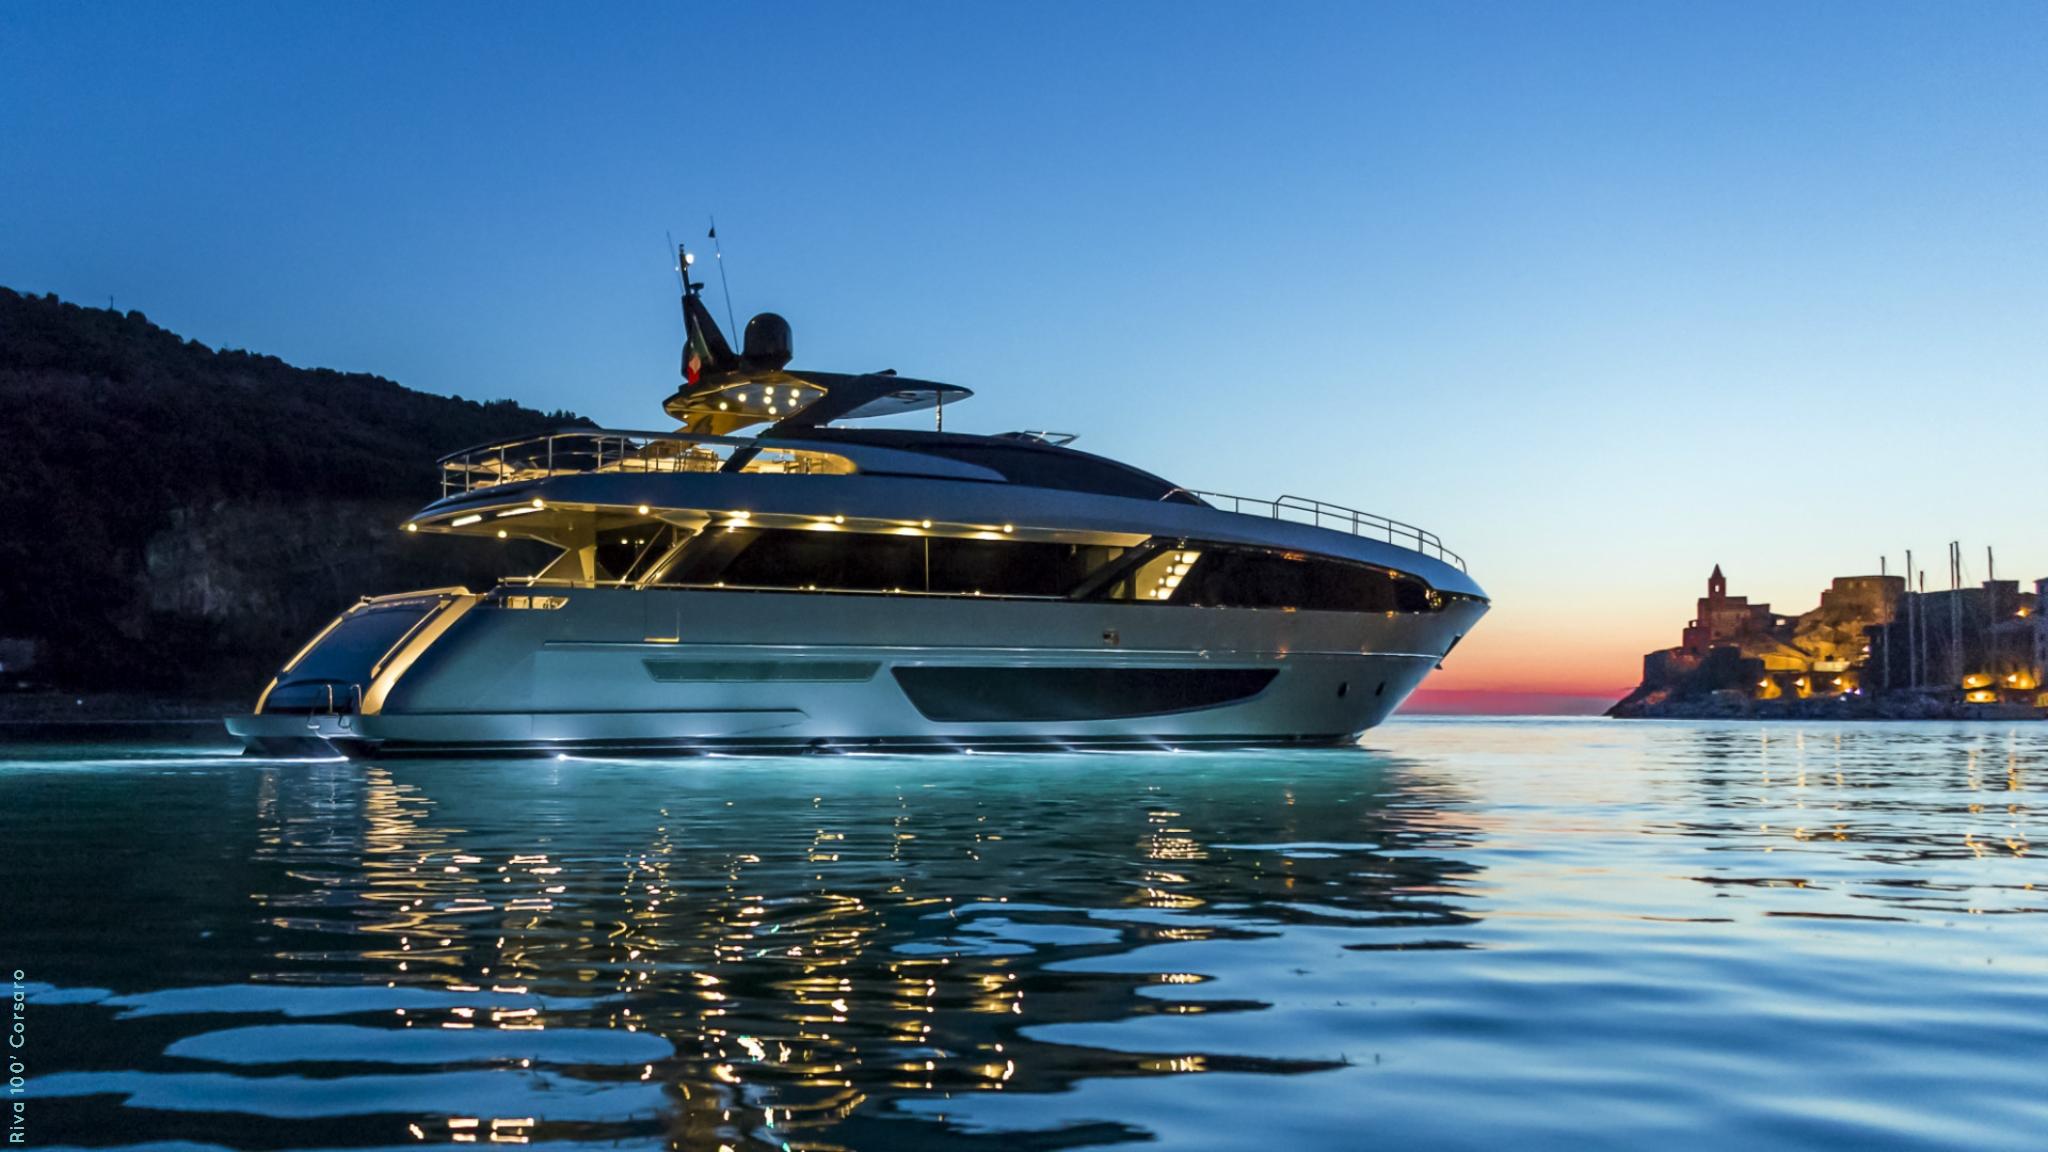 Riva Corsaro motor yacht